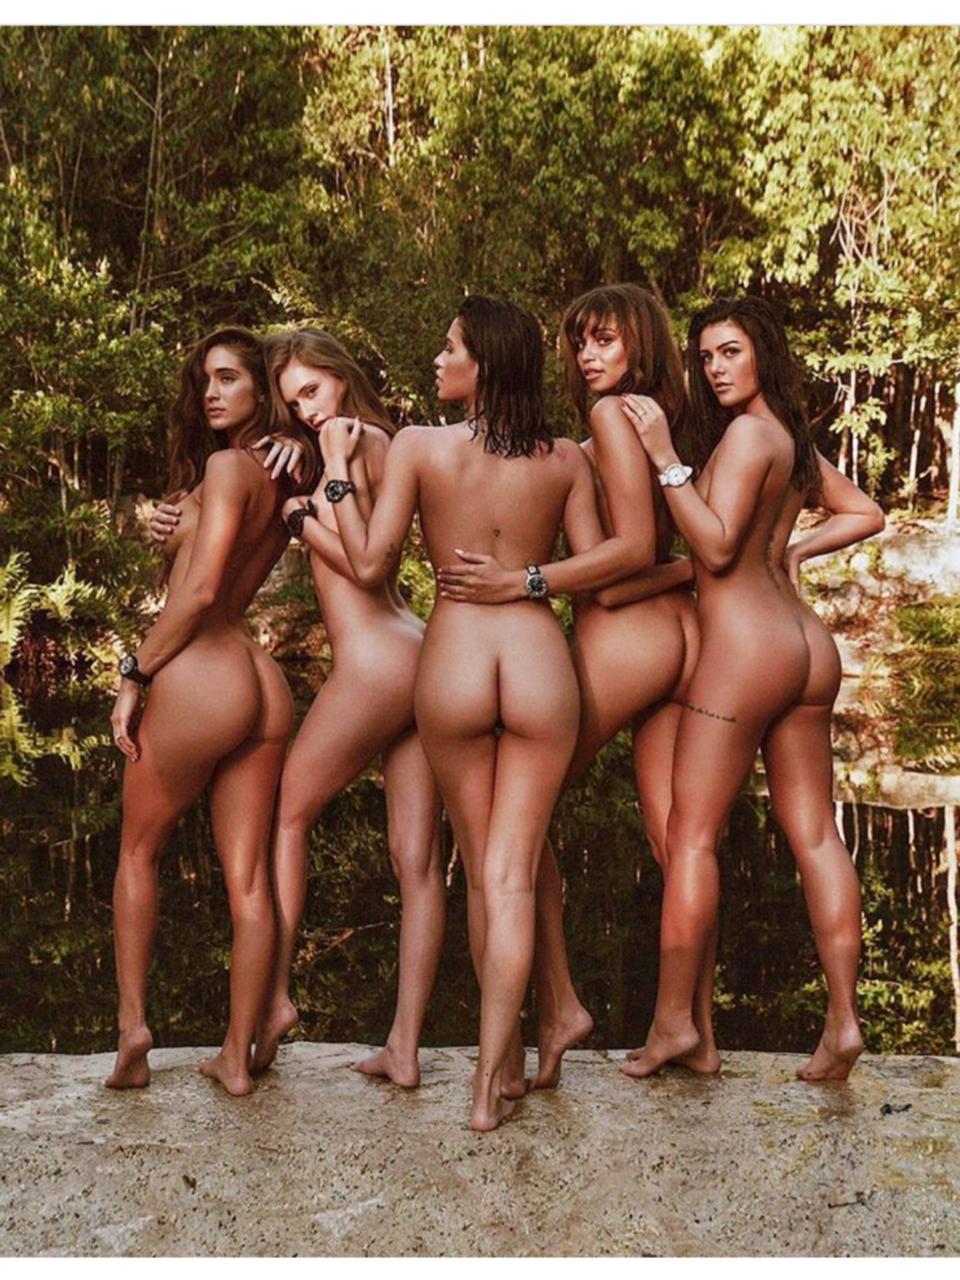 Tori Green Nude Photos Leaked!0007